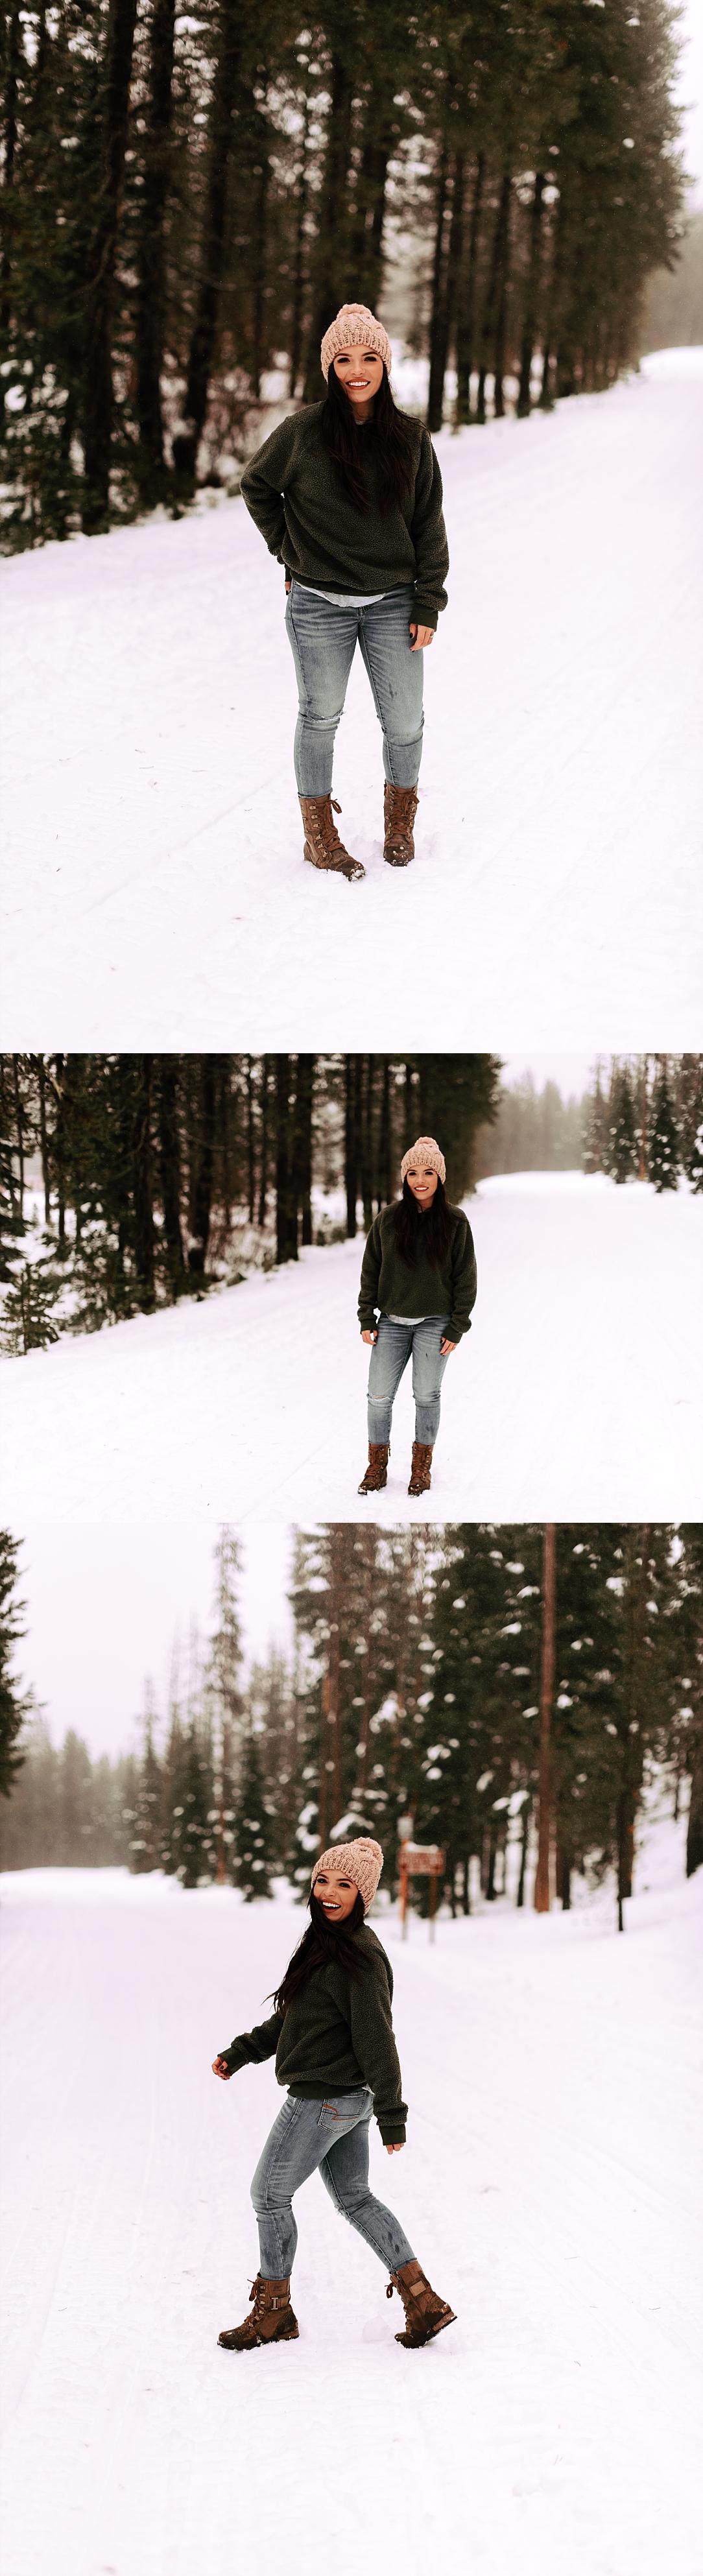 snowy portrait session_0012.jpg